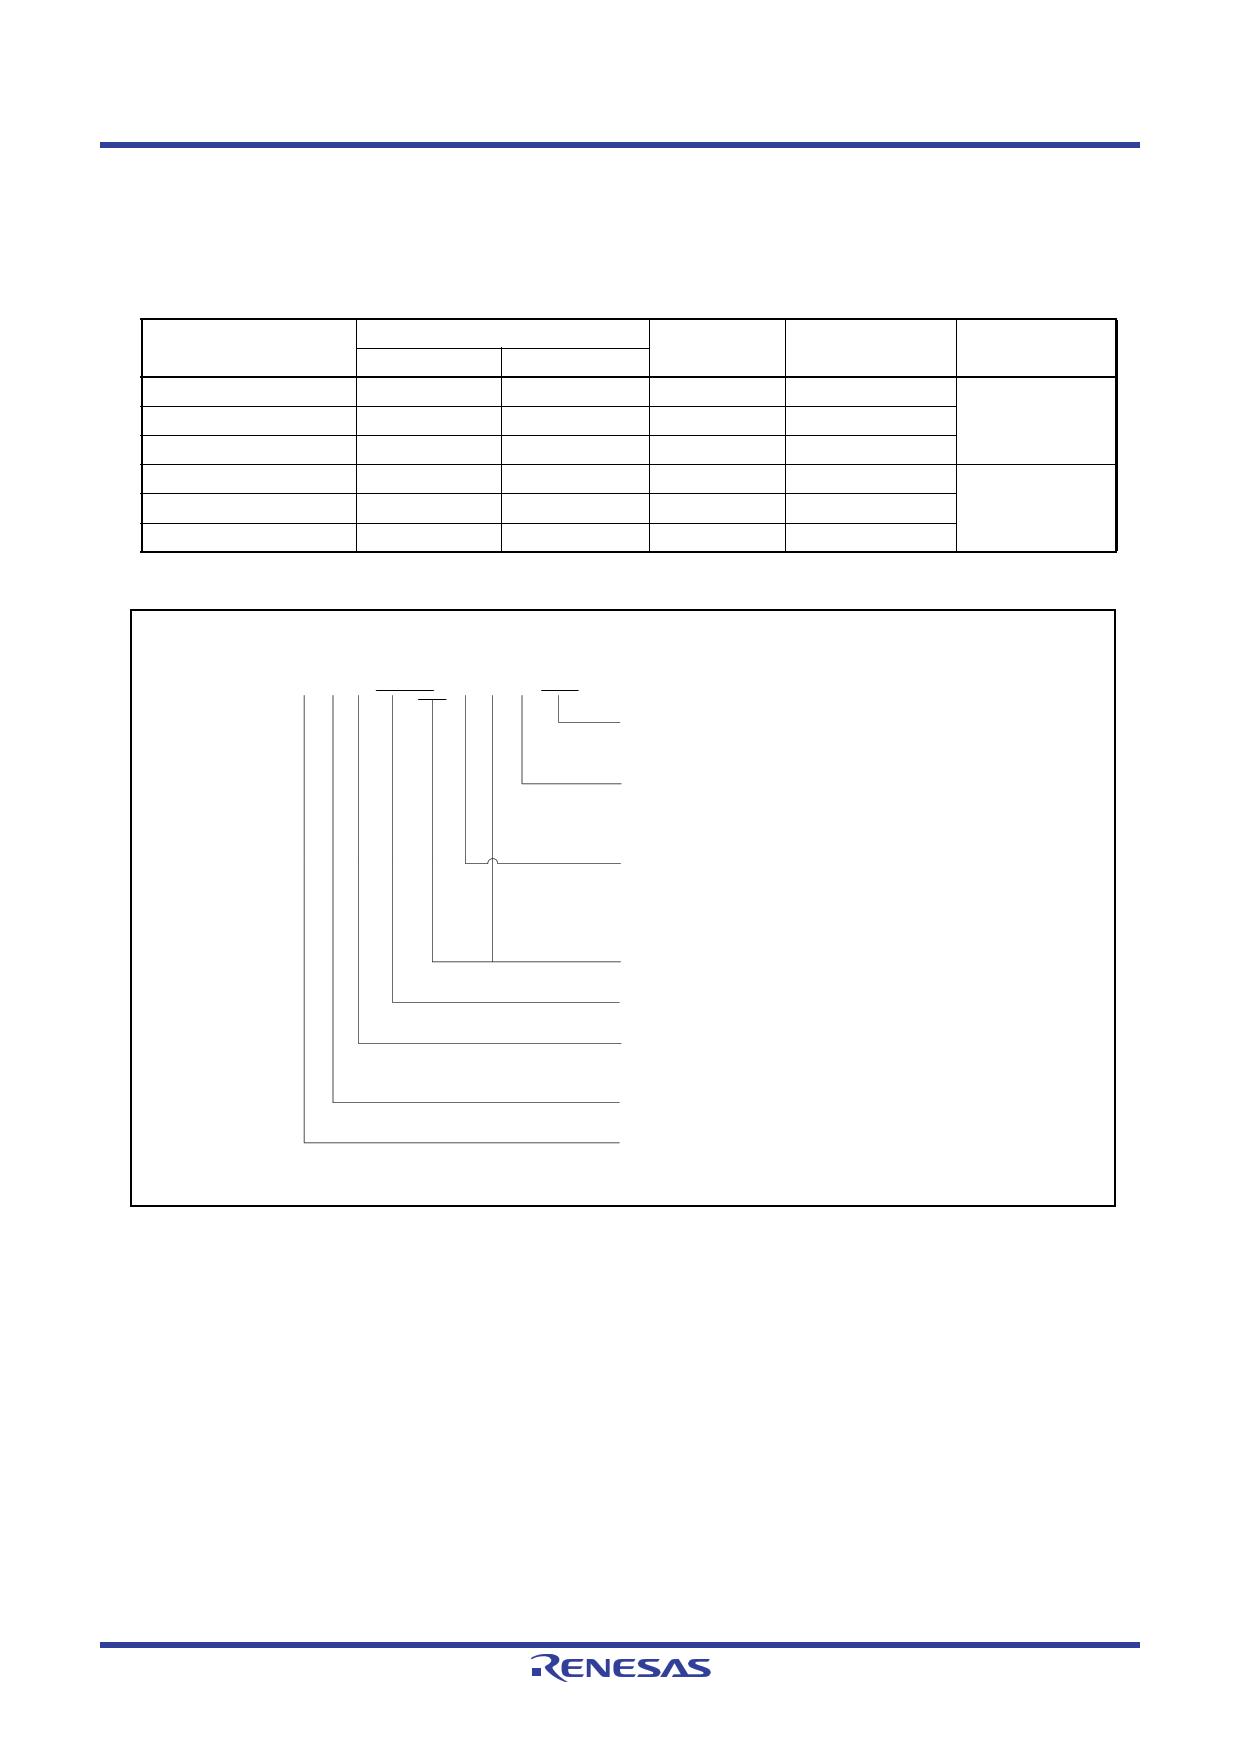 R5F21346CNFP pdf, 반도체, 판매, 대치품